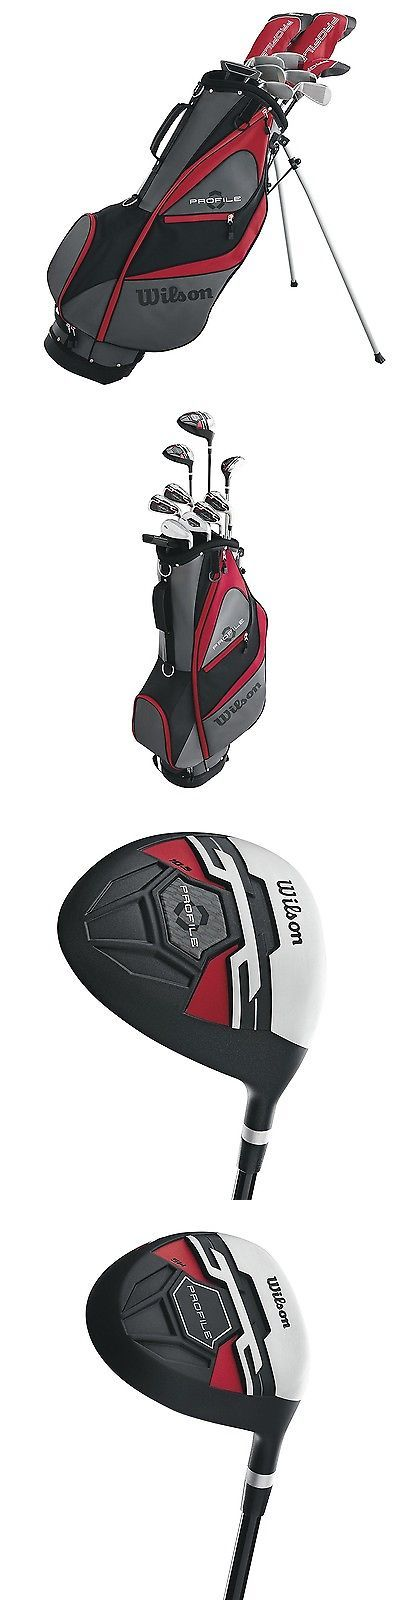 Golf Clubs 50127: Wilson Profile Xd Men S Rh Flex Graphite Steel Golf Club Stand Bag Package Set -> BUY IT NOW ONLY: $299.99 on eBay!